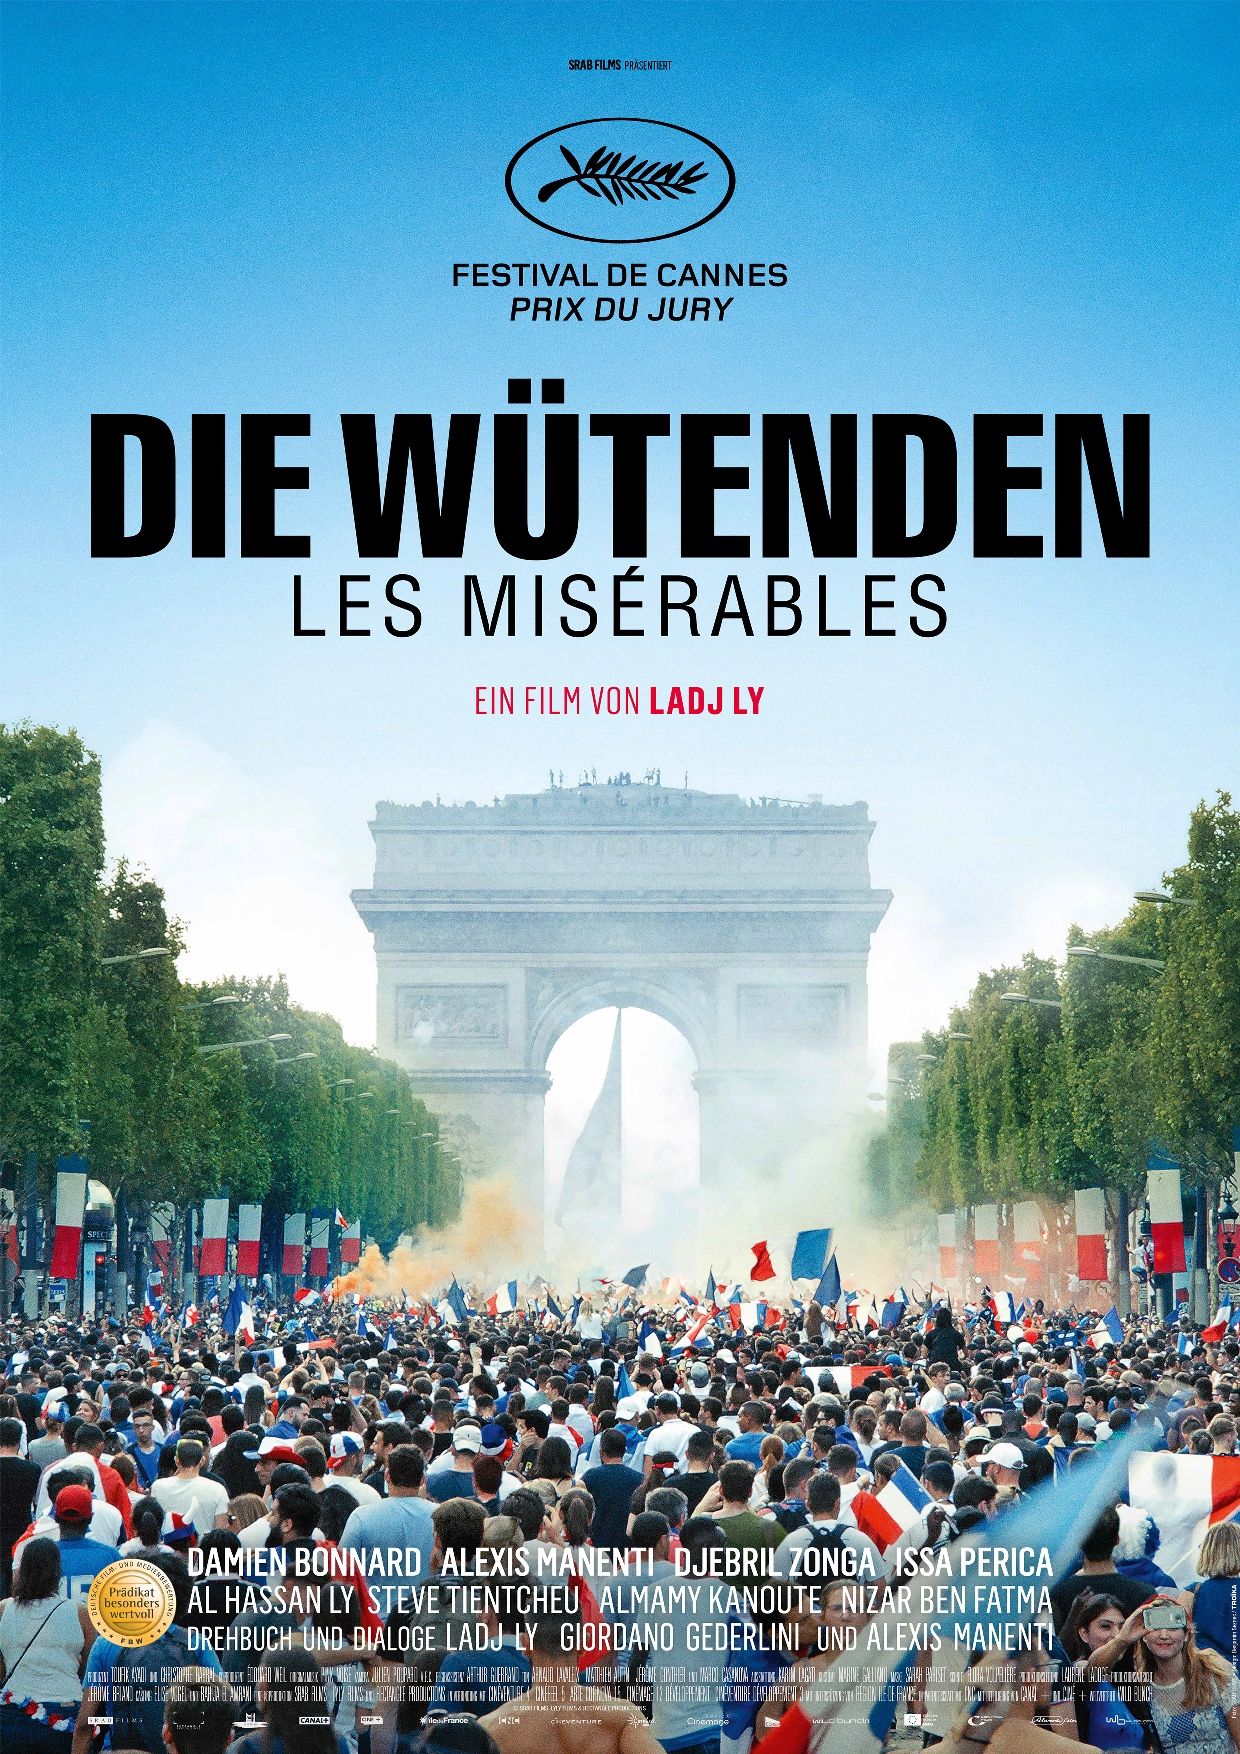 Filmpremiere: DIE WÜTENDEN - LES MISÉRABLES am 23. January 2020 @ Apollo - Das Kino.